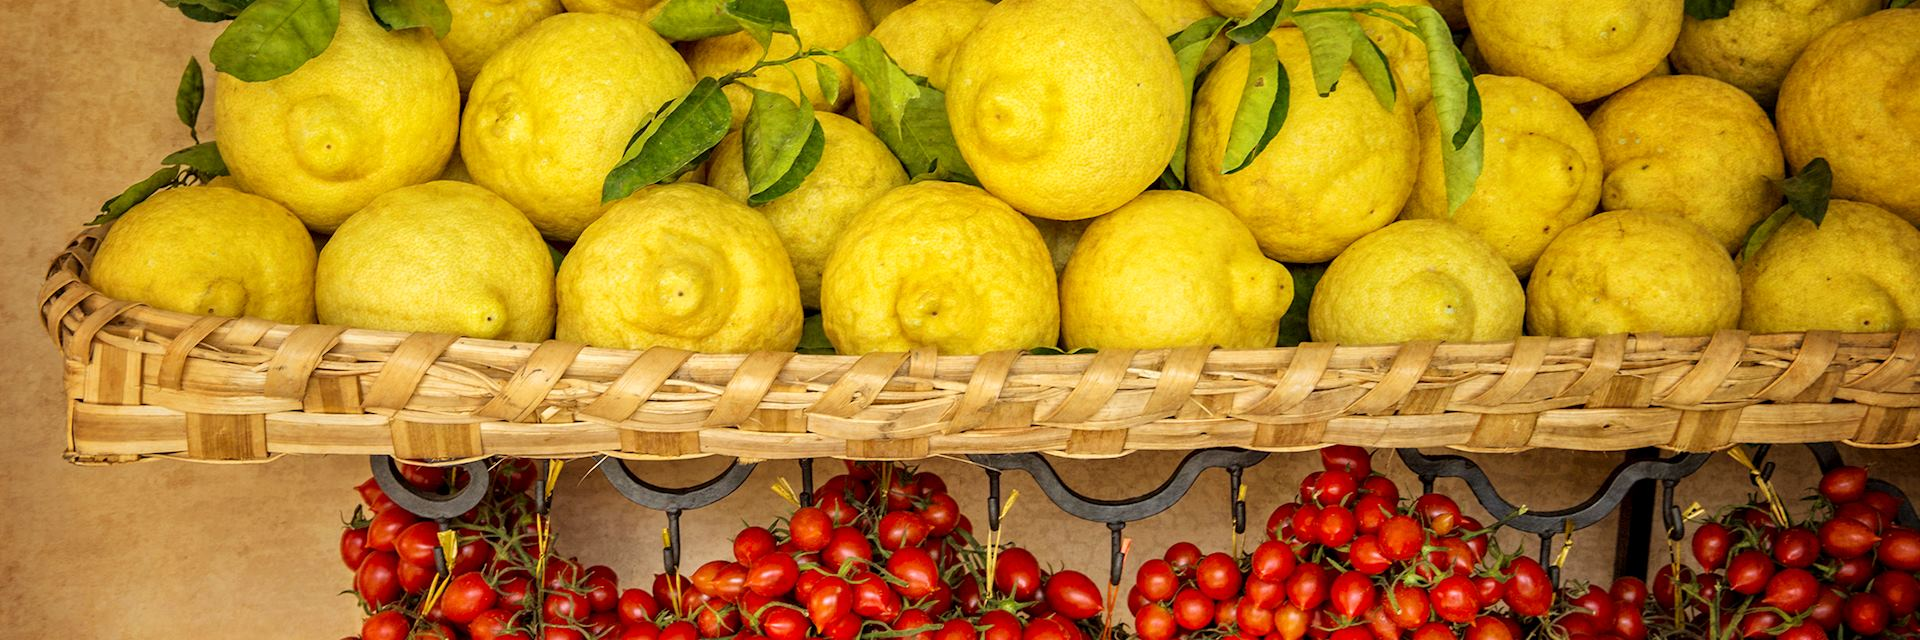 Lemons grown on the Amalfi Coast, Italy